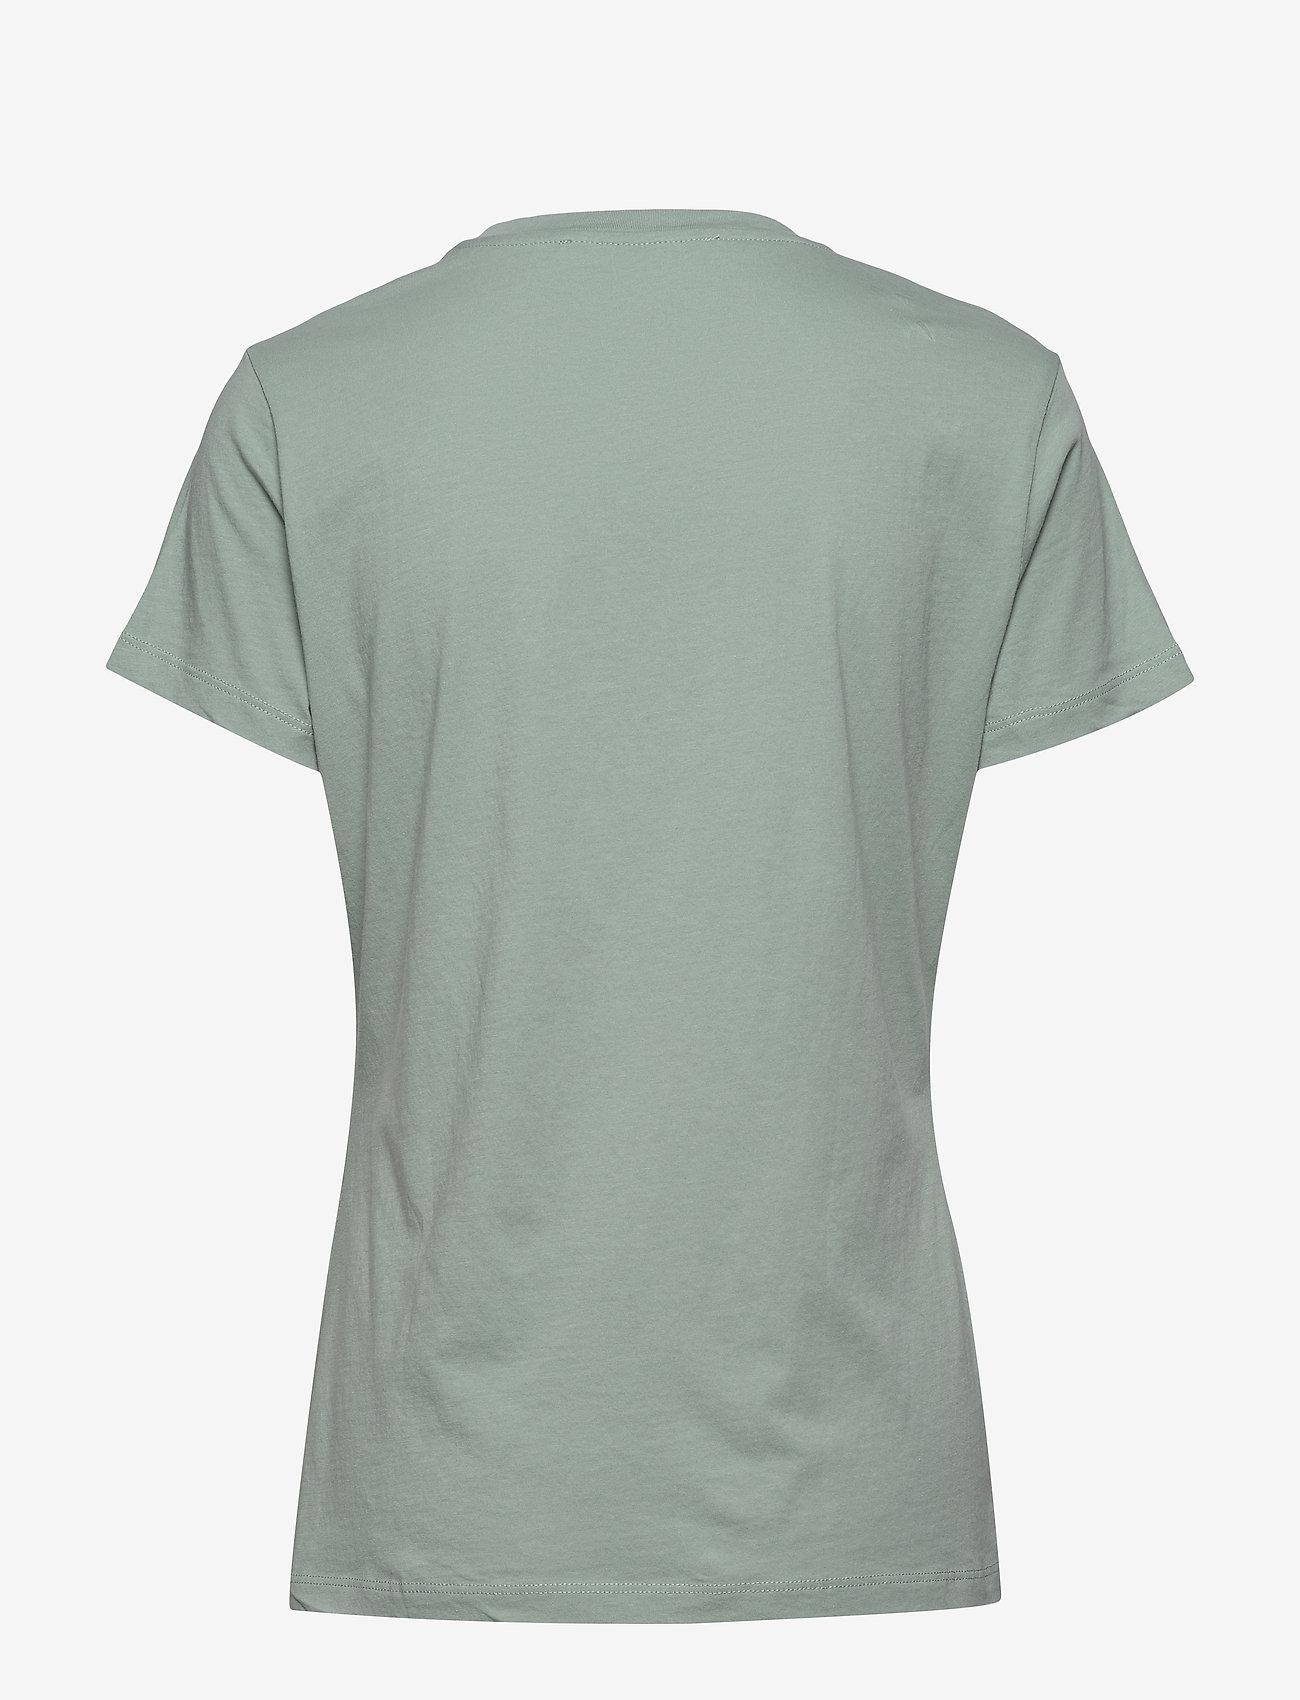 Samsøe Samsøe - Solly tee solid 205 - t-shirts - chinois green - 1